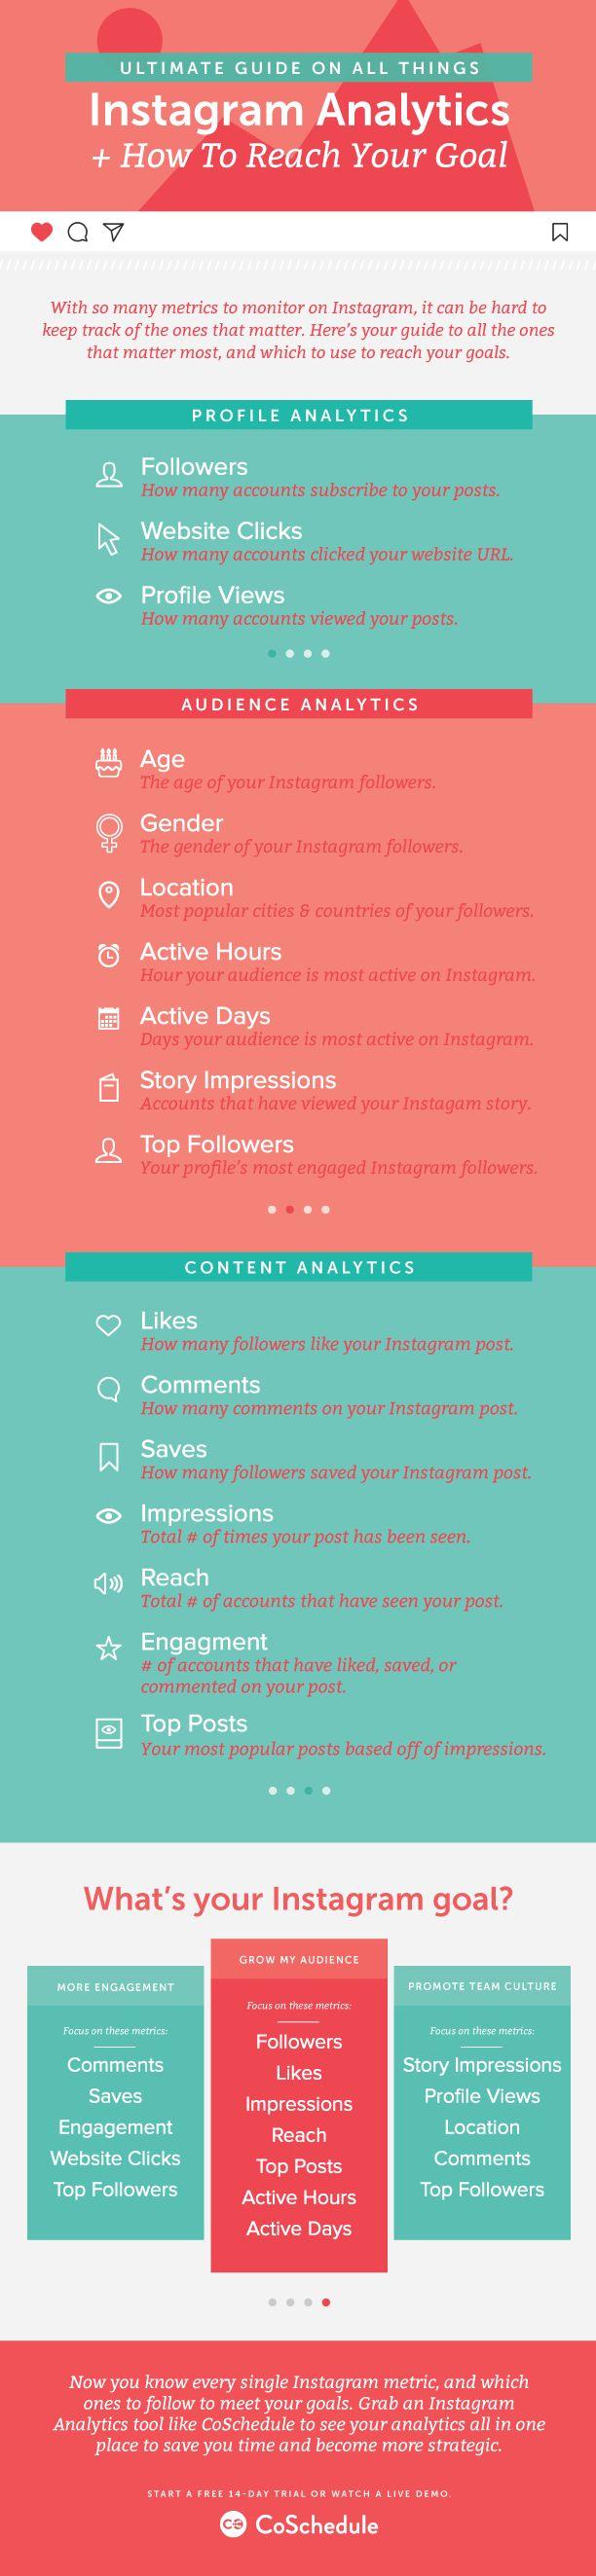 Get Your Free Instagram Analytics Infographic! http://coschedule.com/blog/instagram-analytics/?utm_campaign=coschedule&utm_source=pinterest&utm_medium=CoSchedule&utm_content=Everything%20You%20Need%20To%20Know%20About%20Instagram%20Analytics%20%2B%204%20Free%20Tools